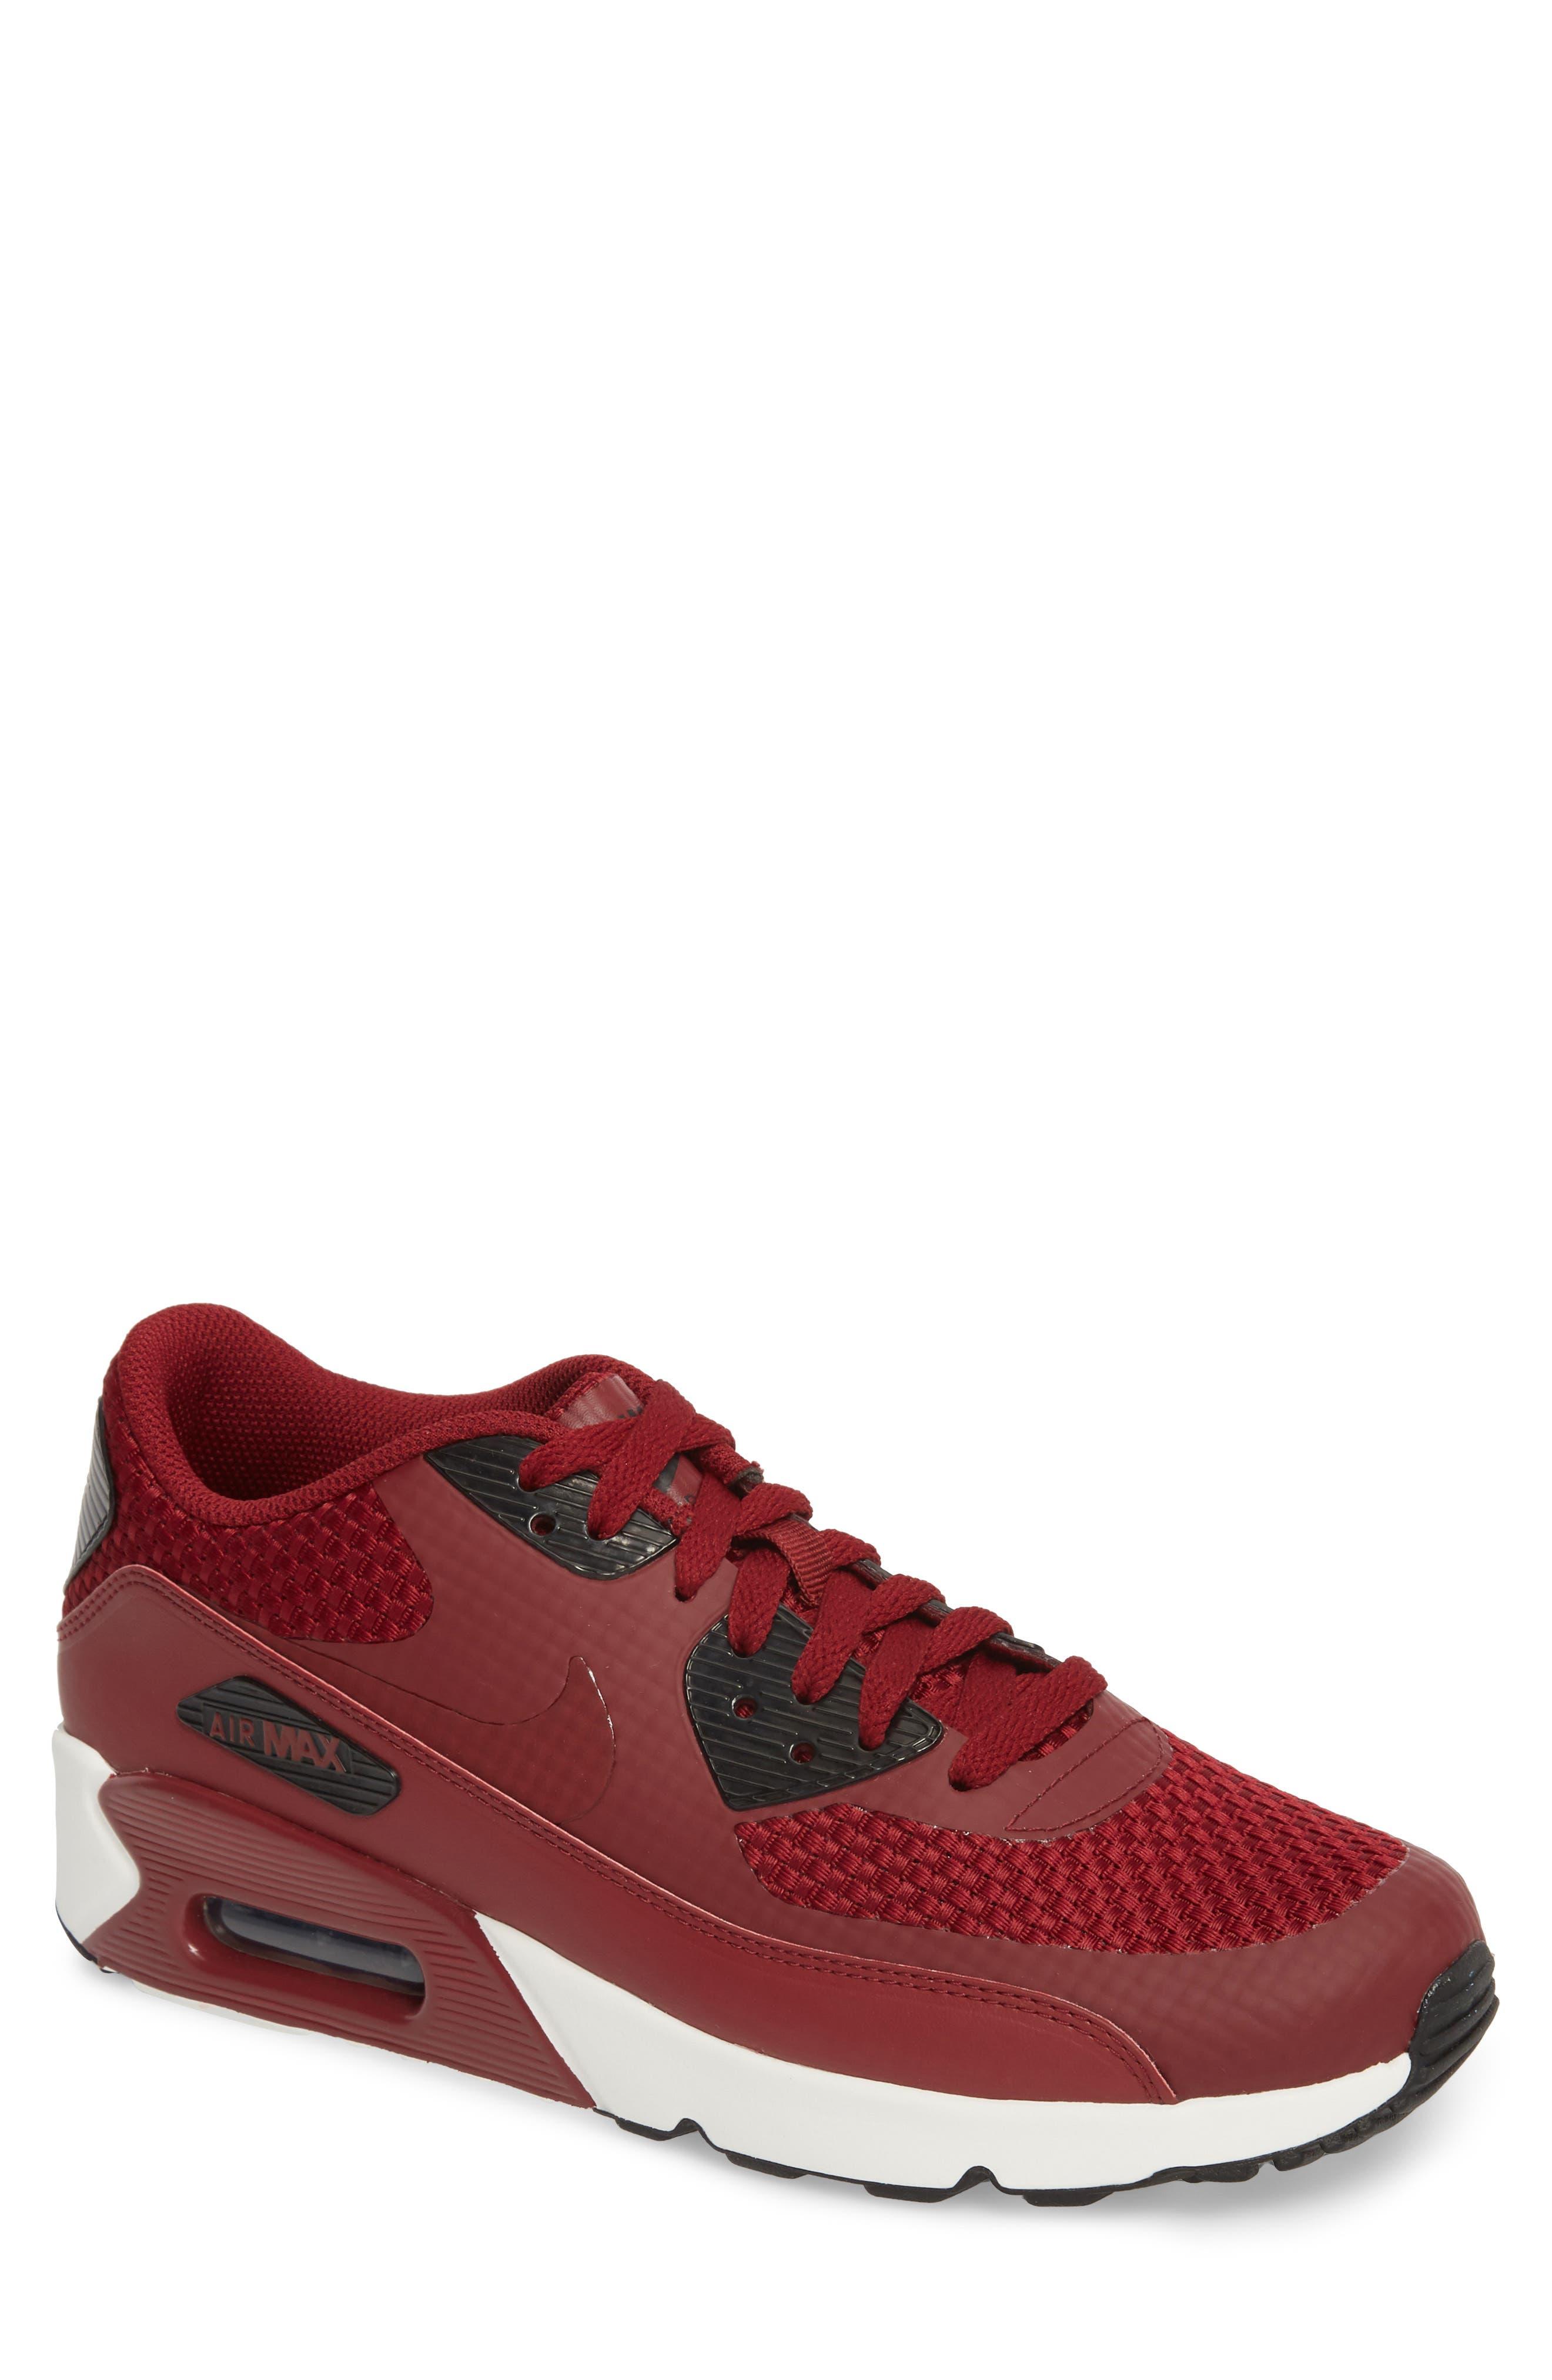 Air Max 90 Ultra 2.0 SE Sneaker,                             Main thumbnail 3, color,